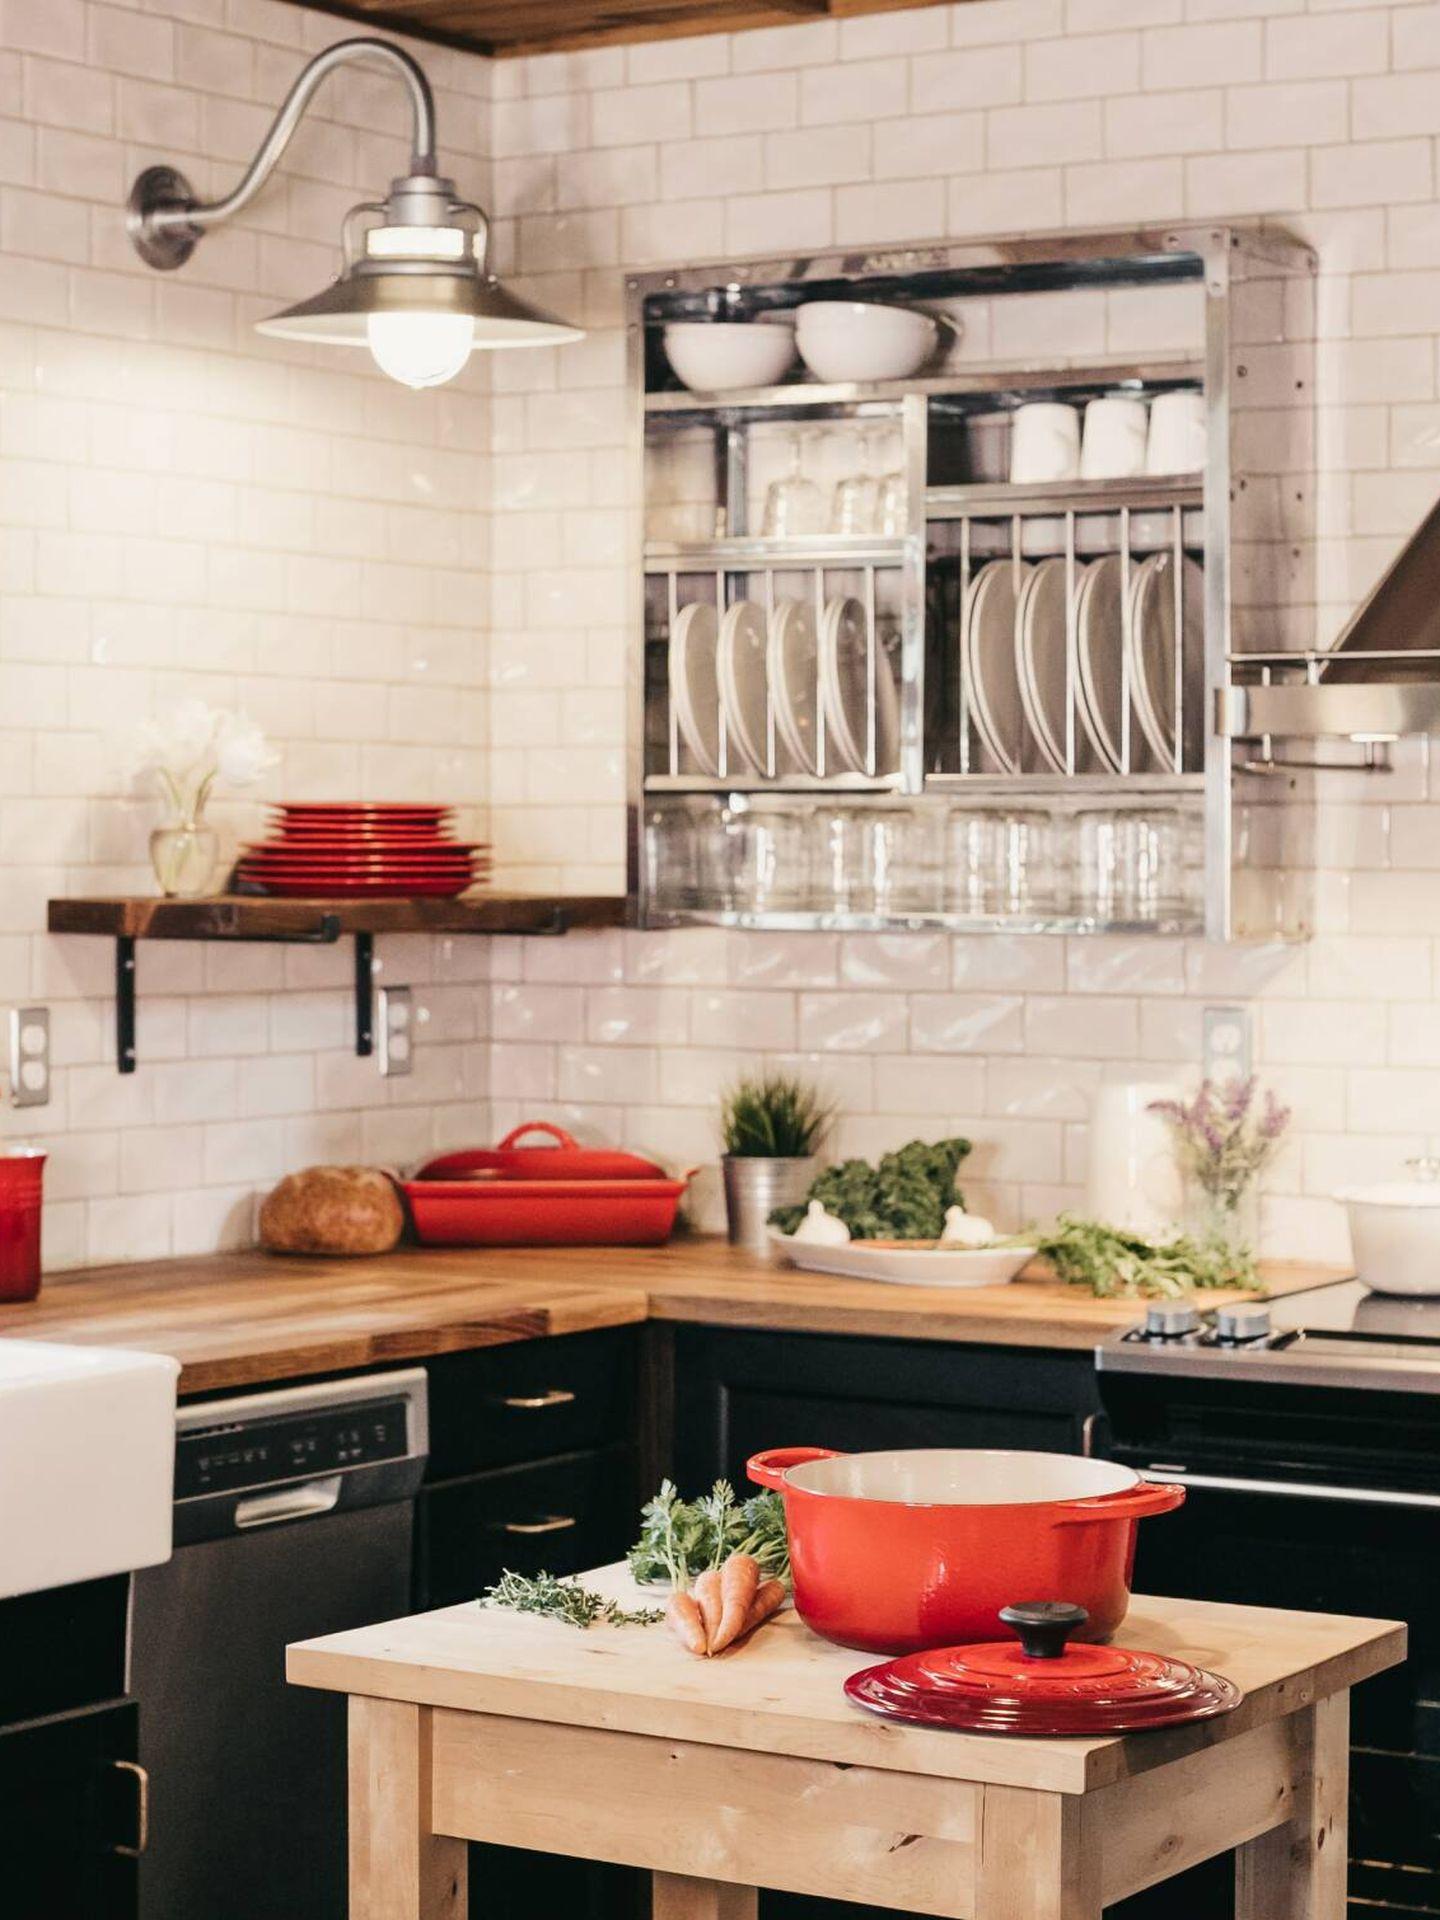 Errores a evitar al organizar tu cocina. (Becca Tapert para Unsplash)